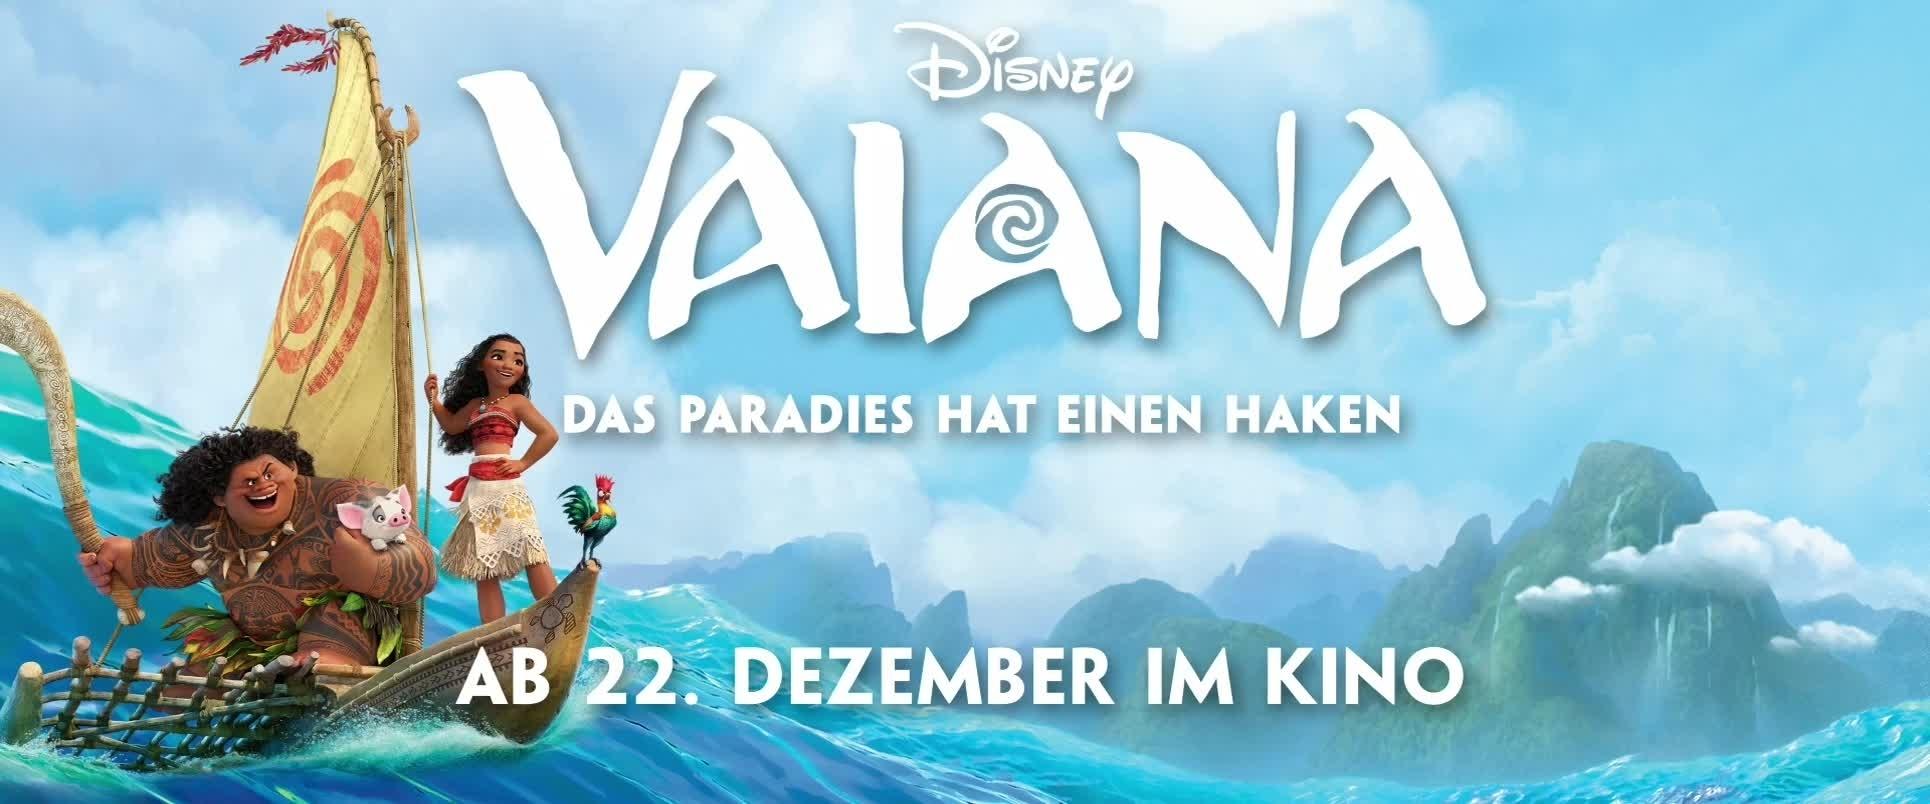 VAIANA - Erster offizieller Trailer - Weihnachten 2016 im Kino | Disney HD